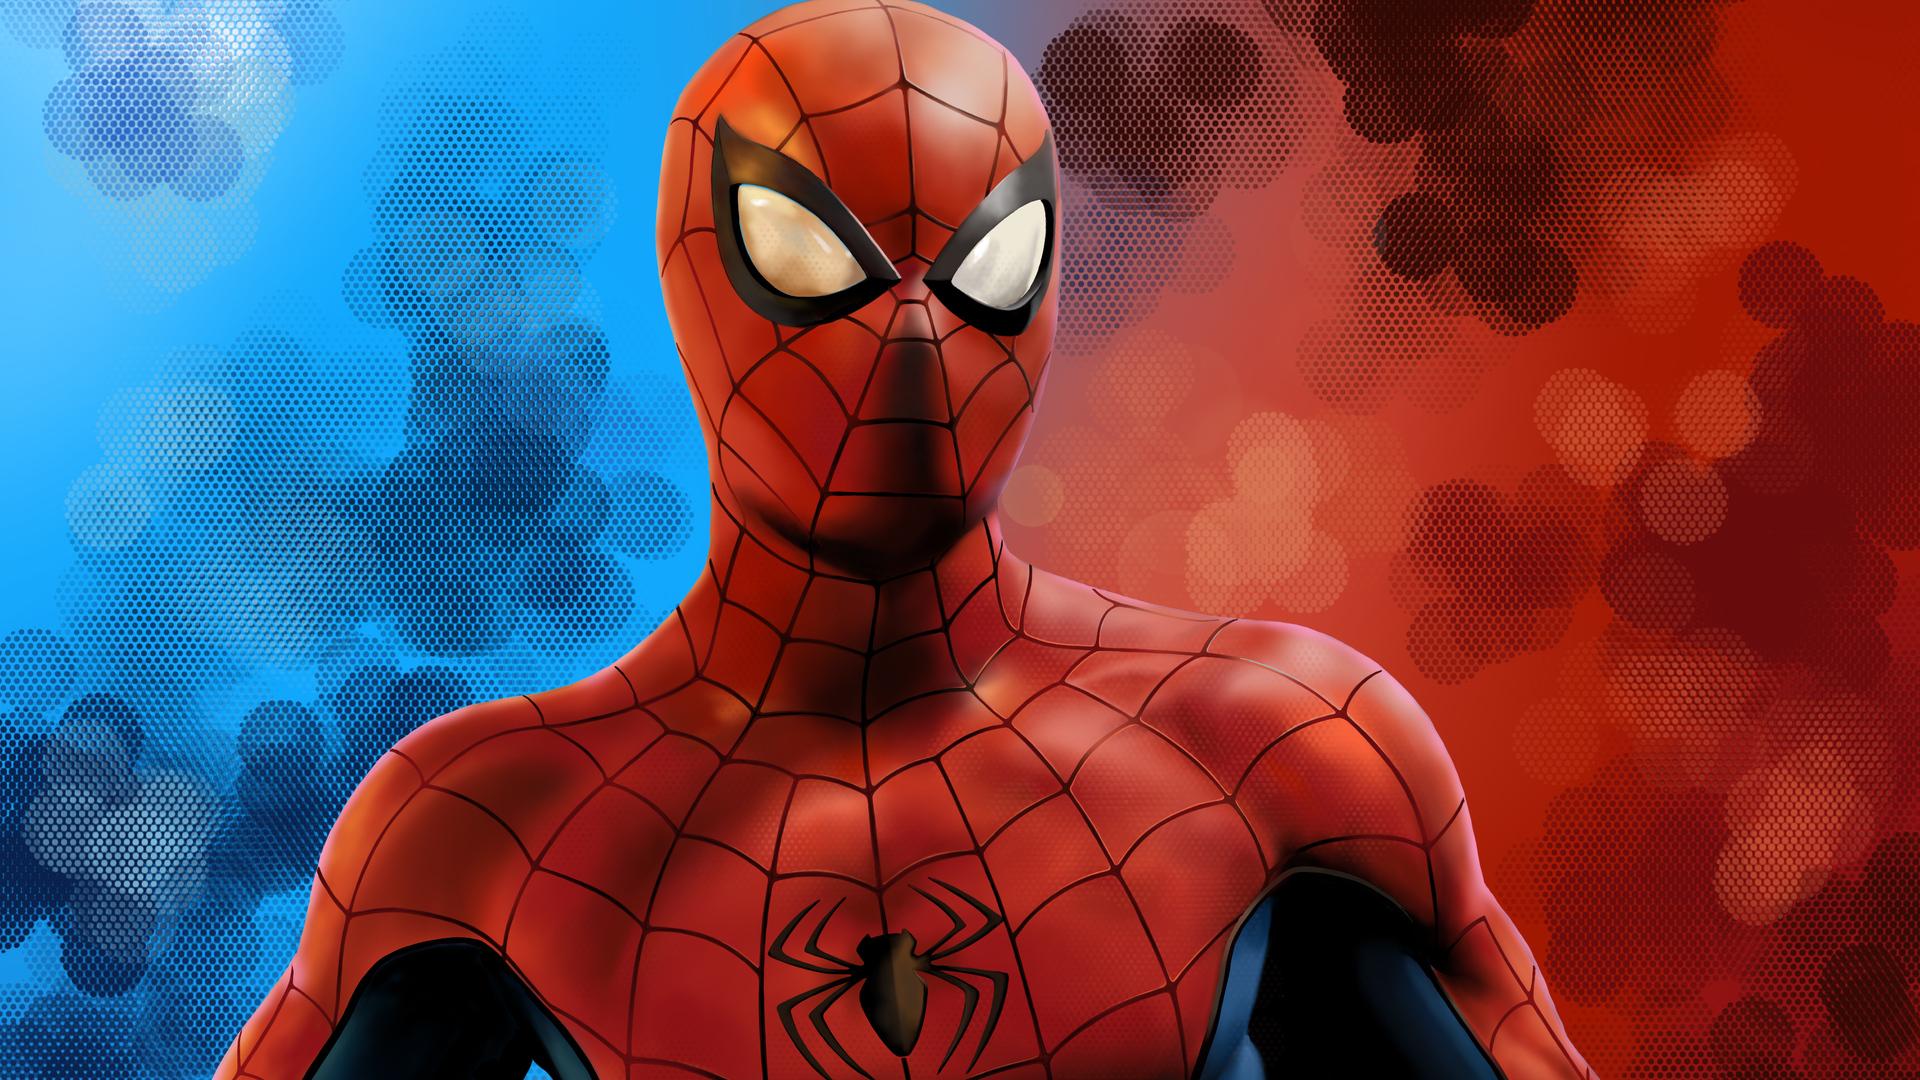 1920x1080 Spider Man Fanart 4k Laptop Full HD 1080P HD 4k ...